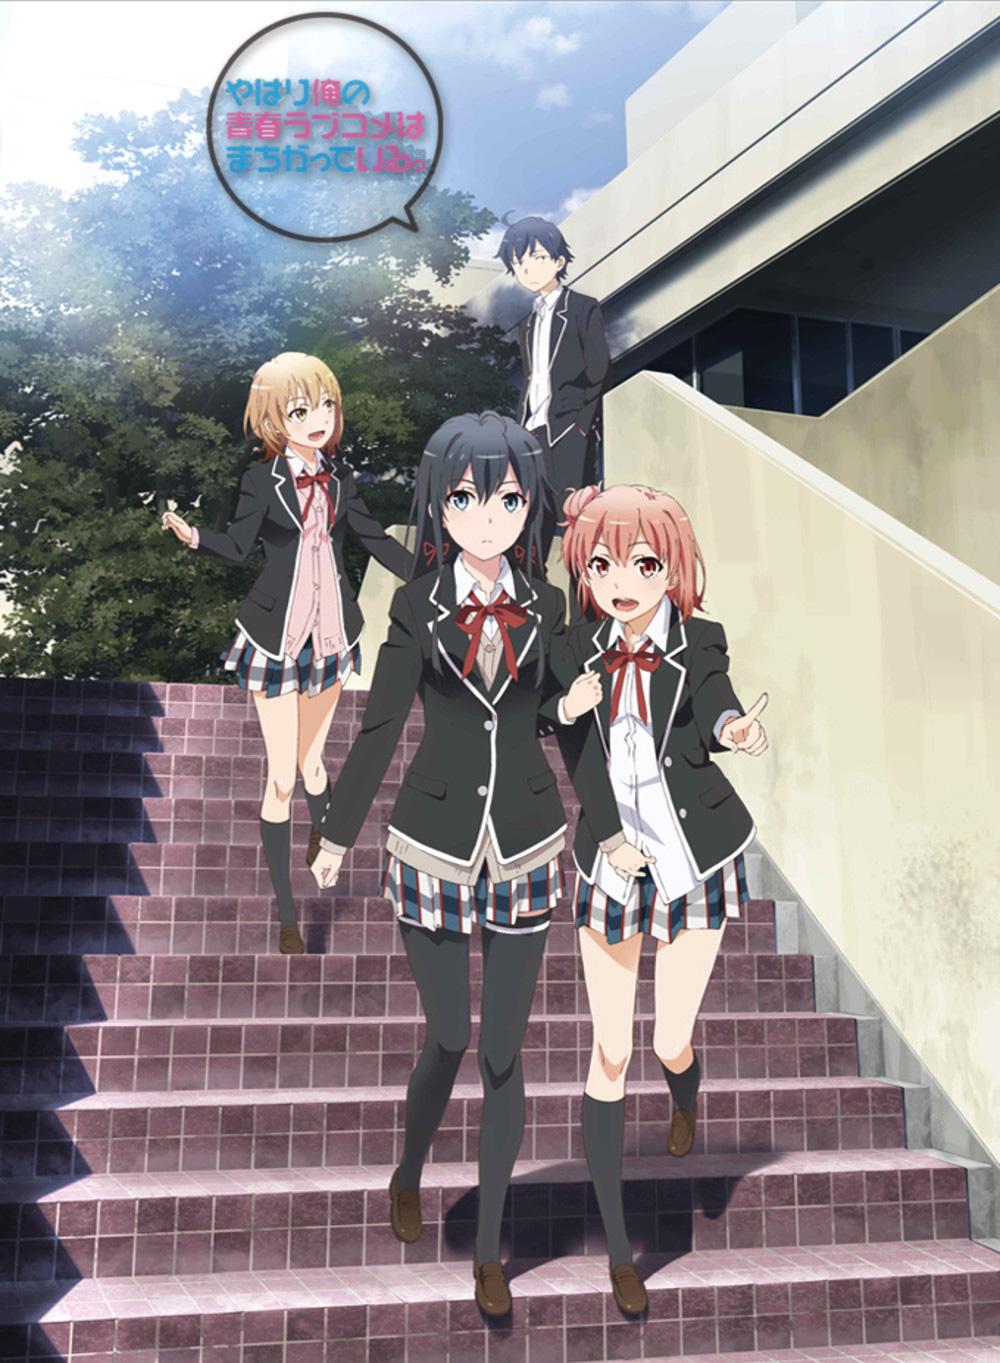 Yahari Ore no Seishun Love Comedy wa Machigatteiru. Zoku, Урэшце, мая юнацкая рамантычная камедыя была памылкай 2, yahari-ore-no-seishun-love-comedy-wa-machigatteiru.-zoku